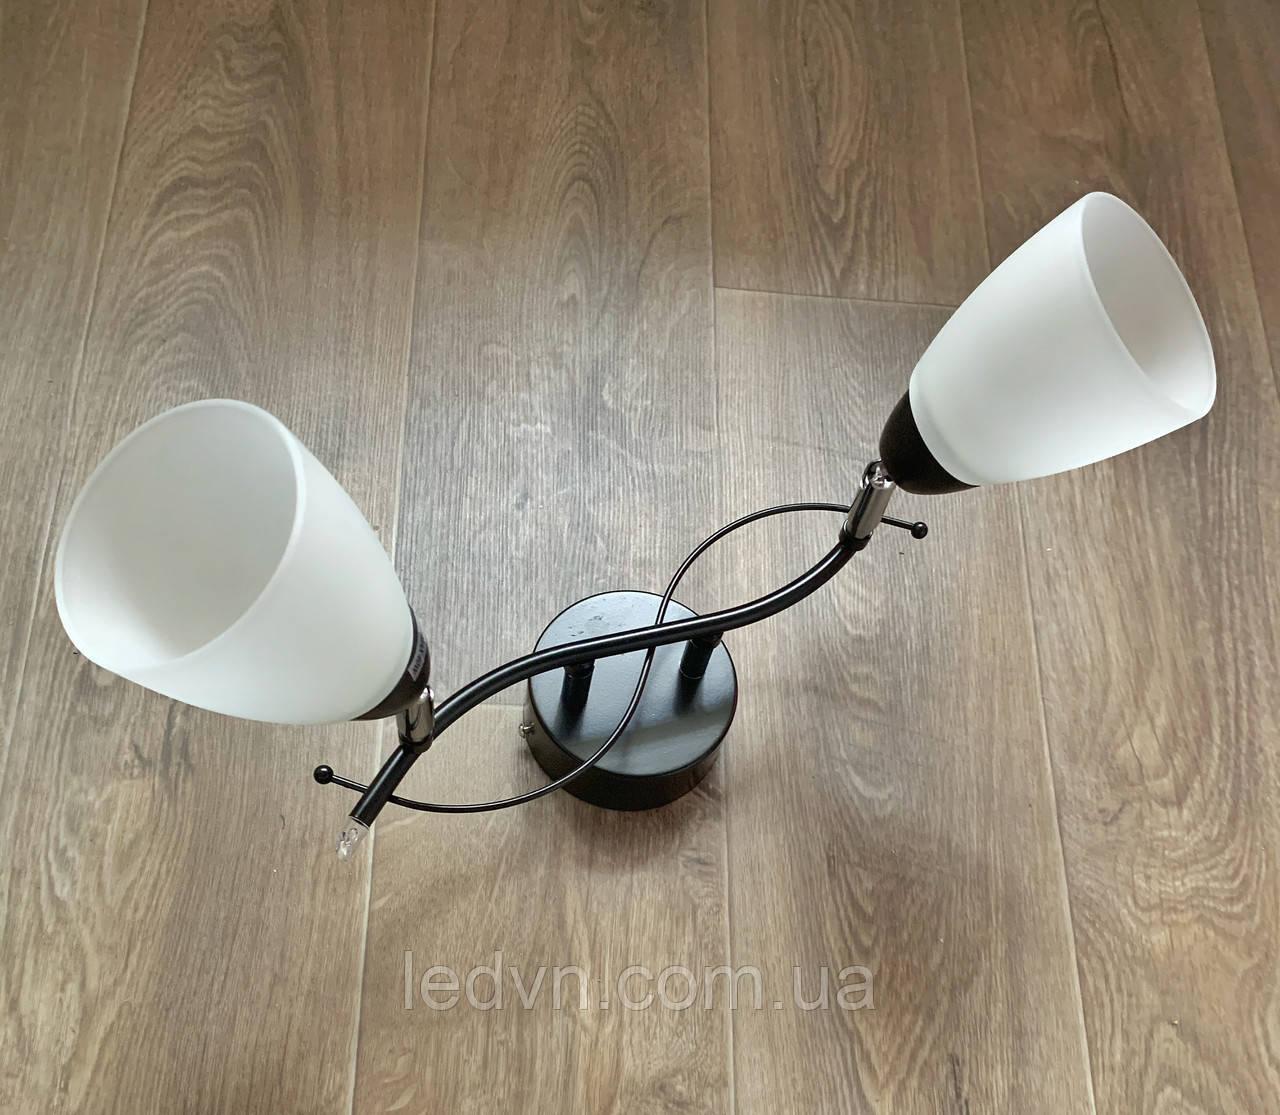 Стельова люстра на 2 лампи чорна з поворотними плафонами